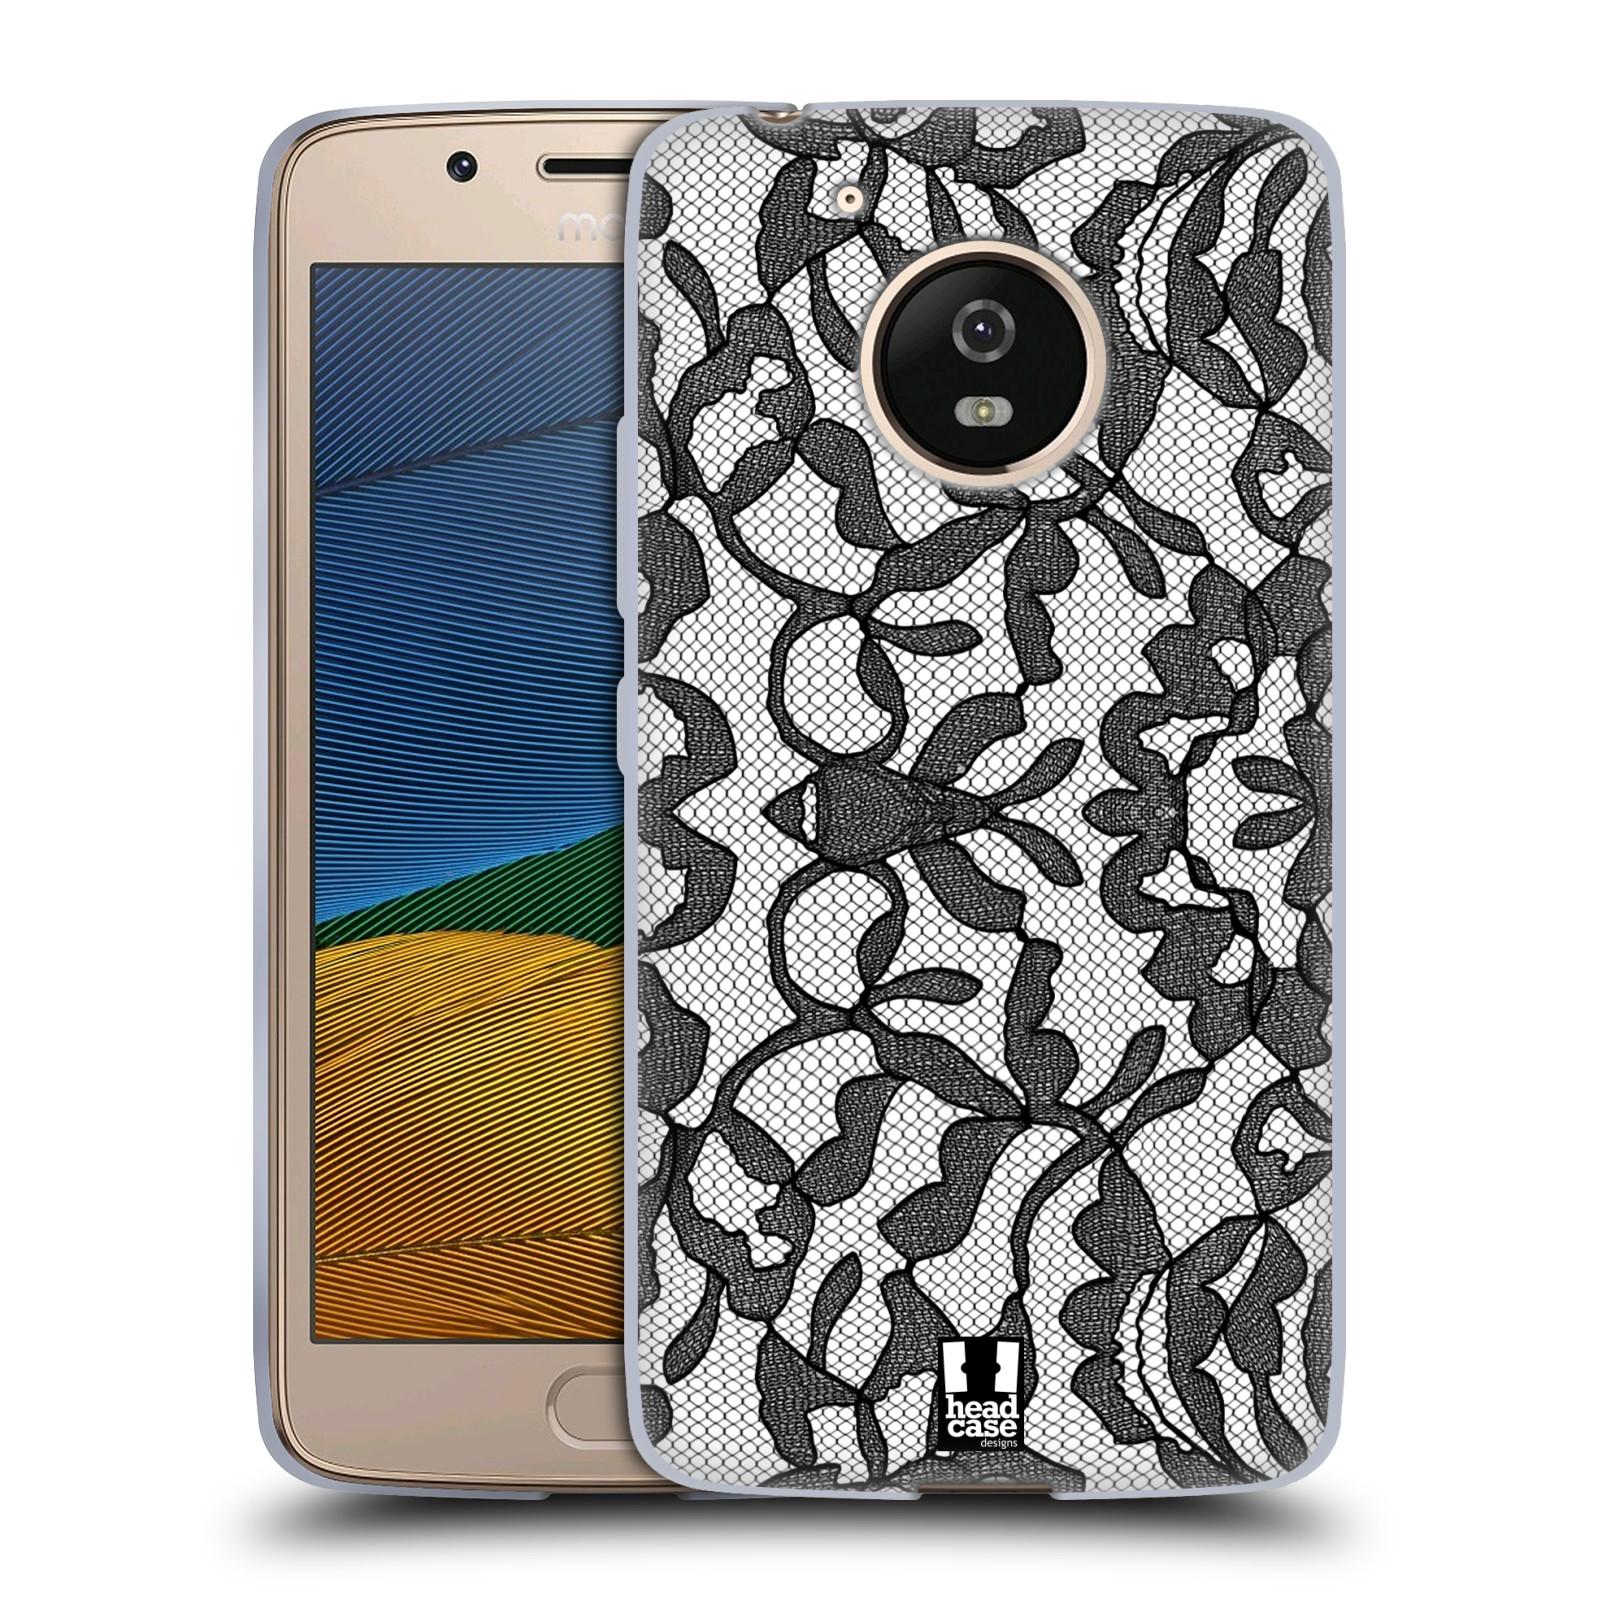 Silikonové pouzdro na mobil Lenovo Moto G5 - Head Case LEAFY KRAJKA